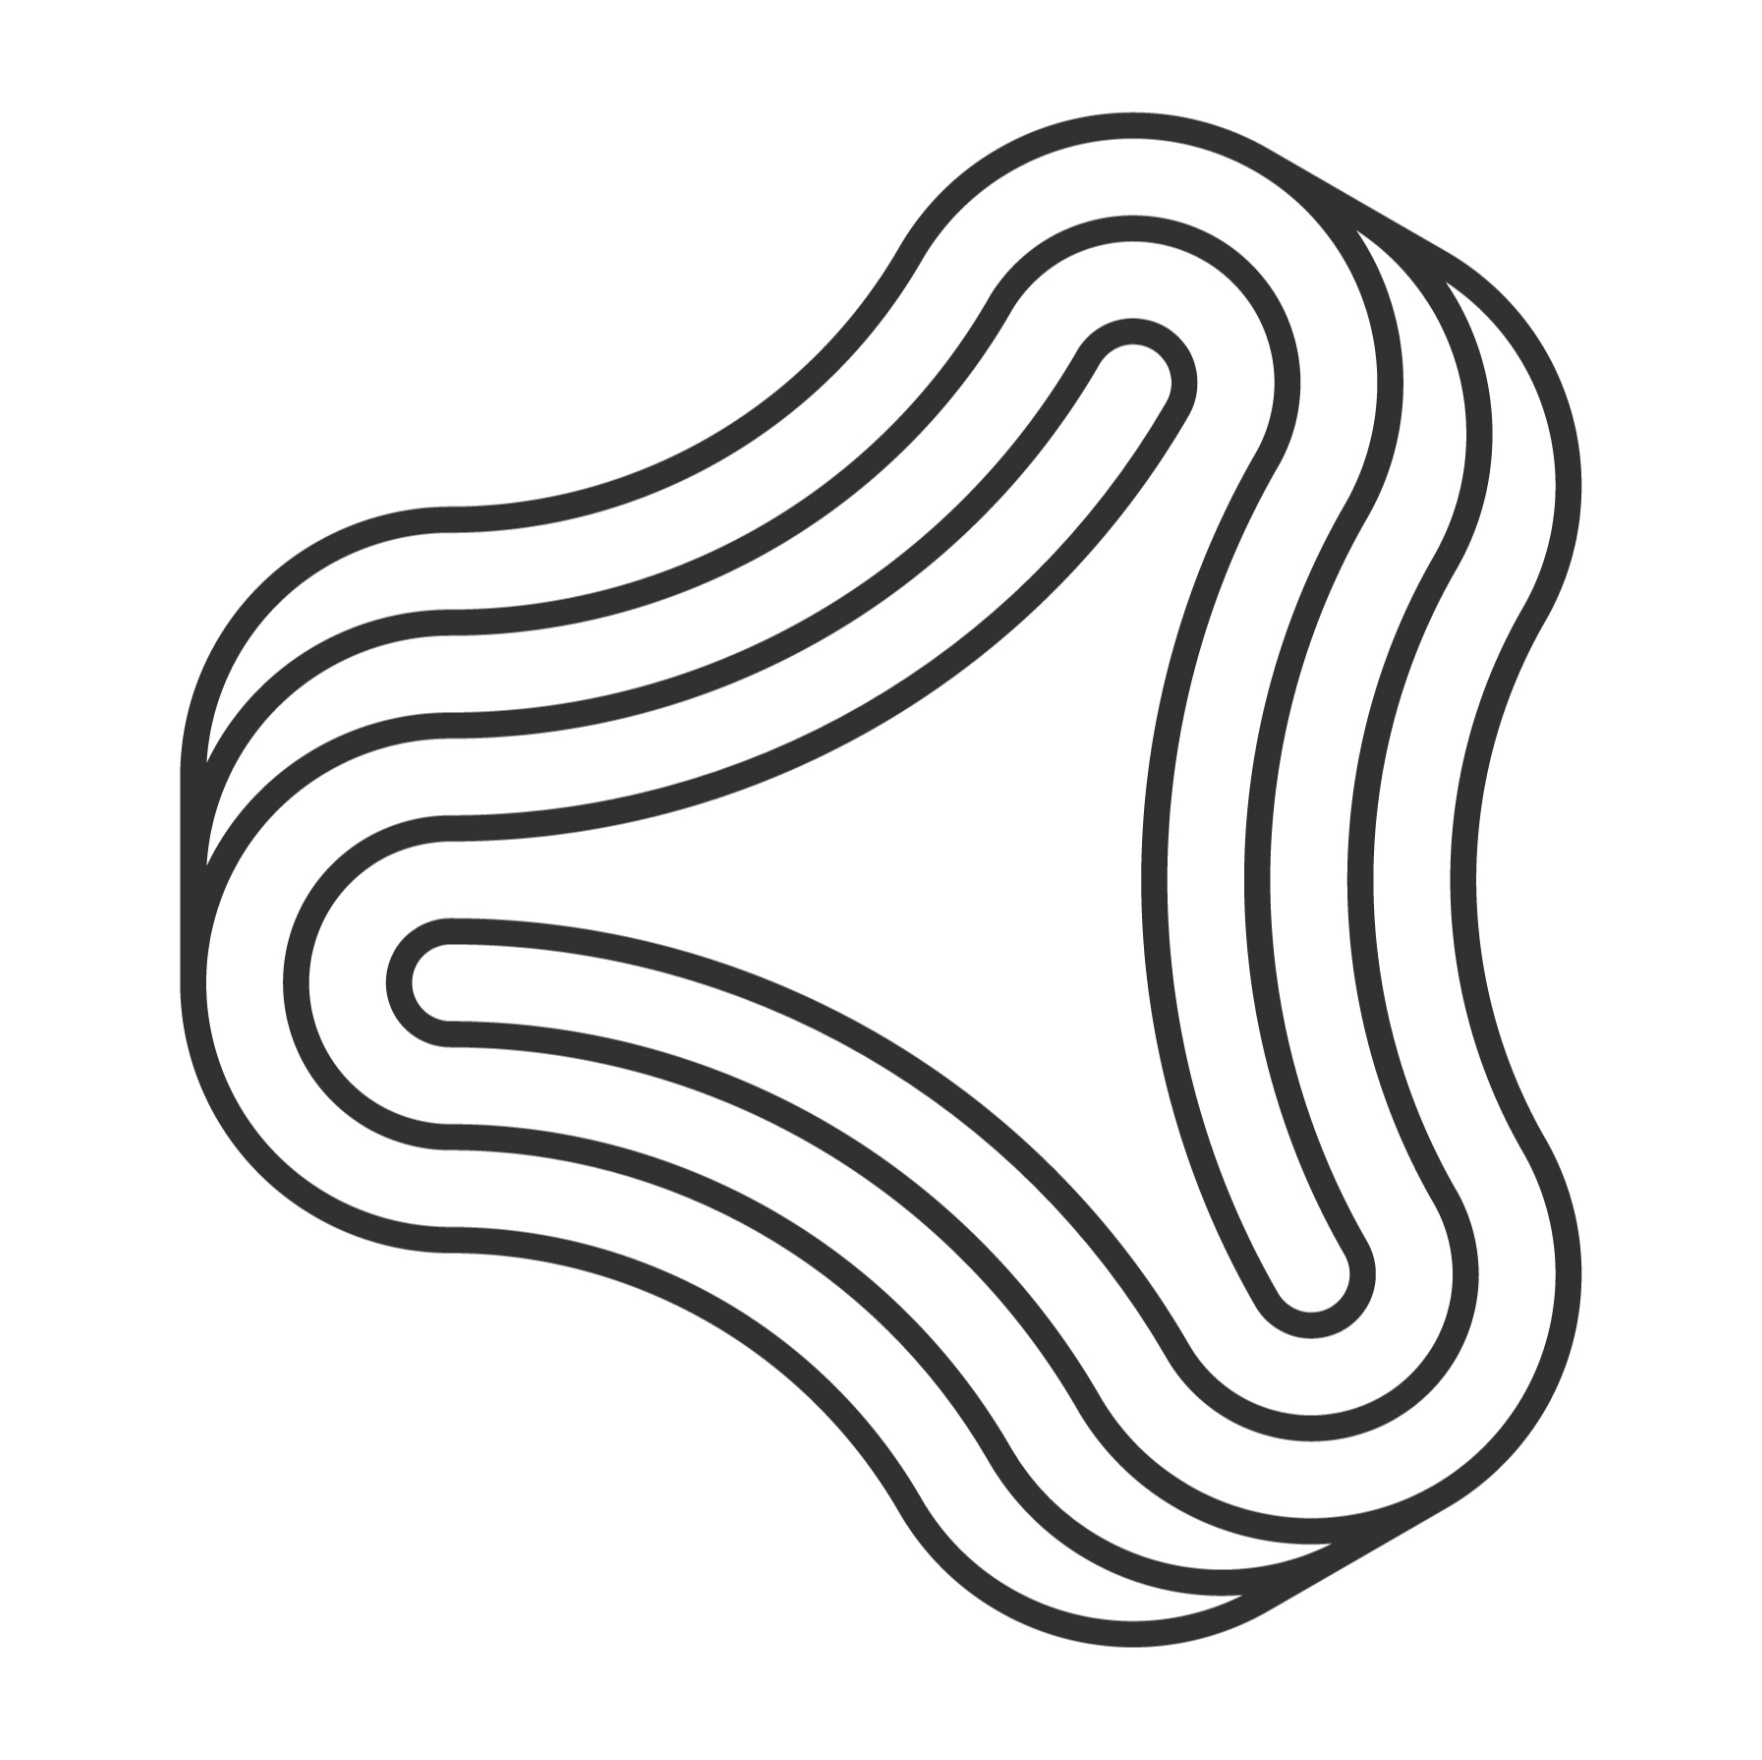 HBJ-01_logo no text.jpg